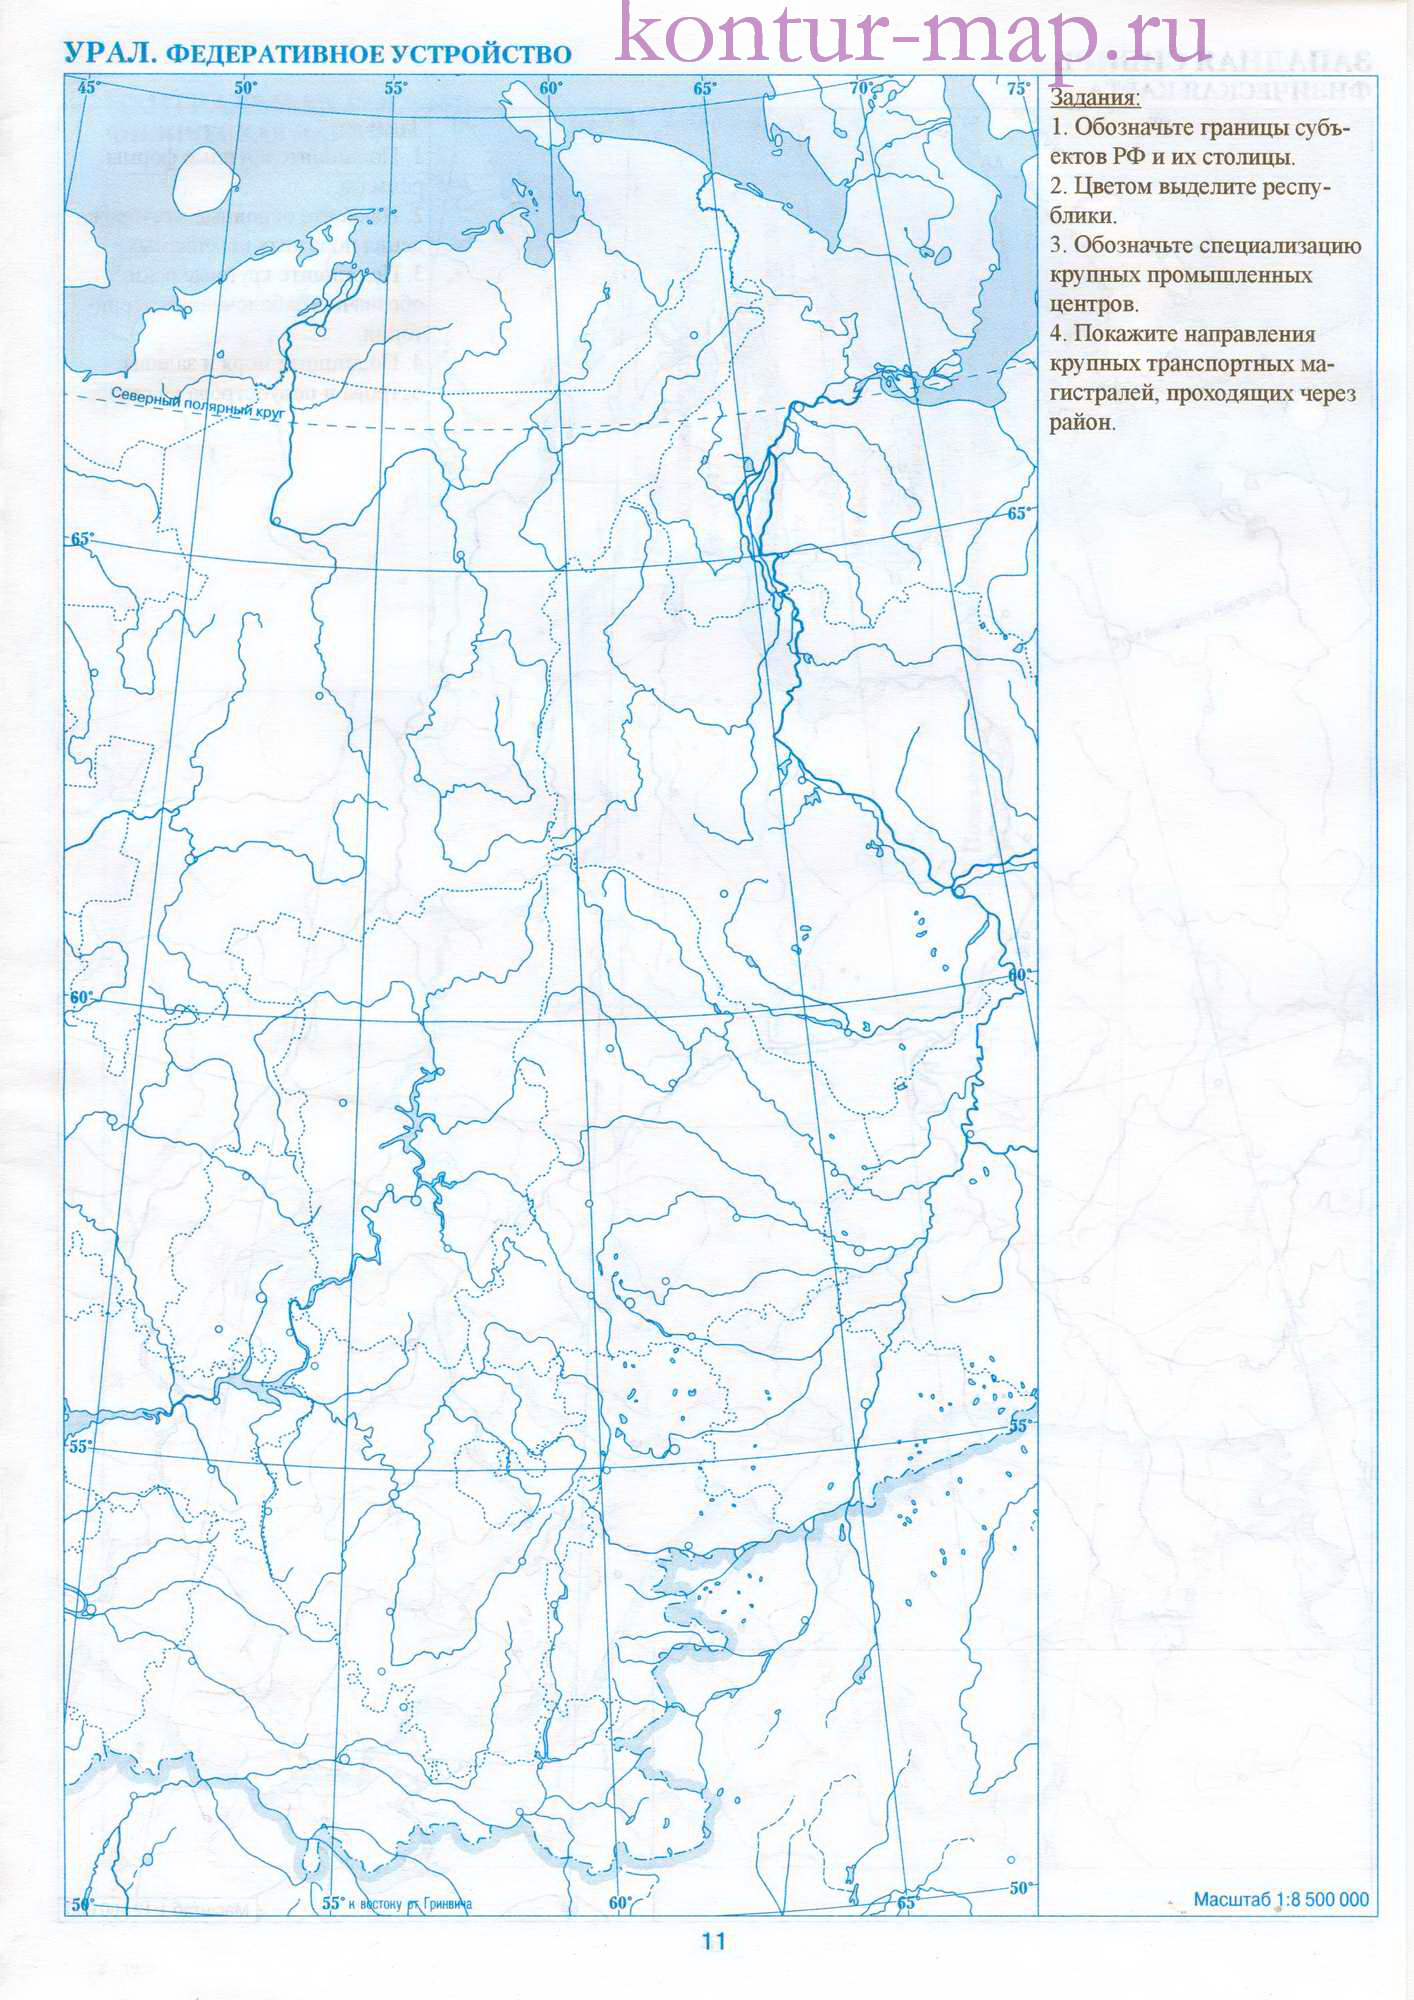 Контурная Карта Снг И России - annablagova17: http://annablagova17.weebly.com/home/konturnaya-karta-sng-i-rossii